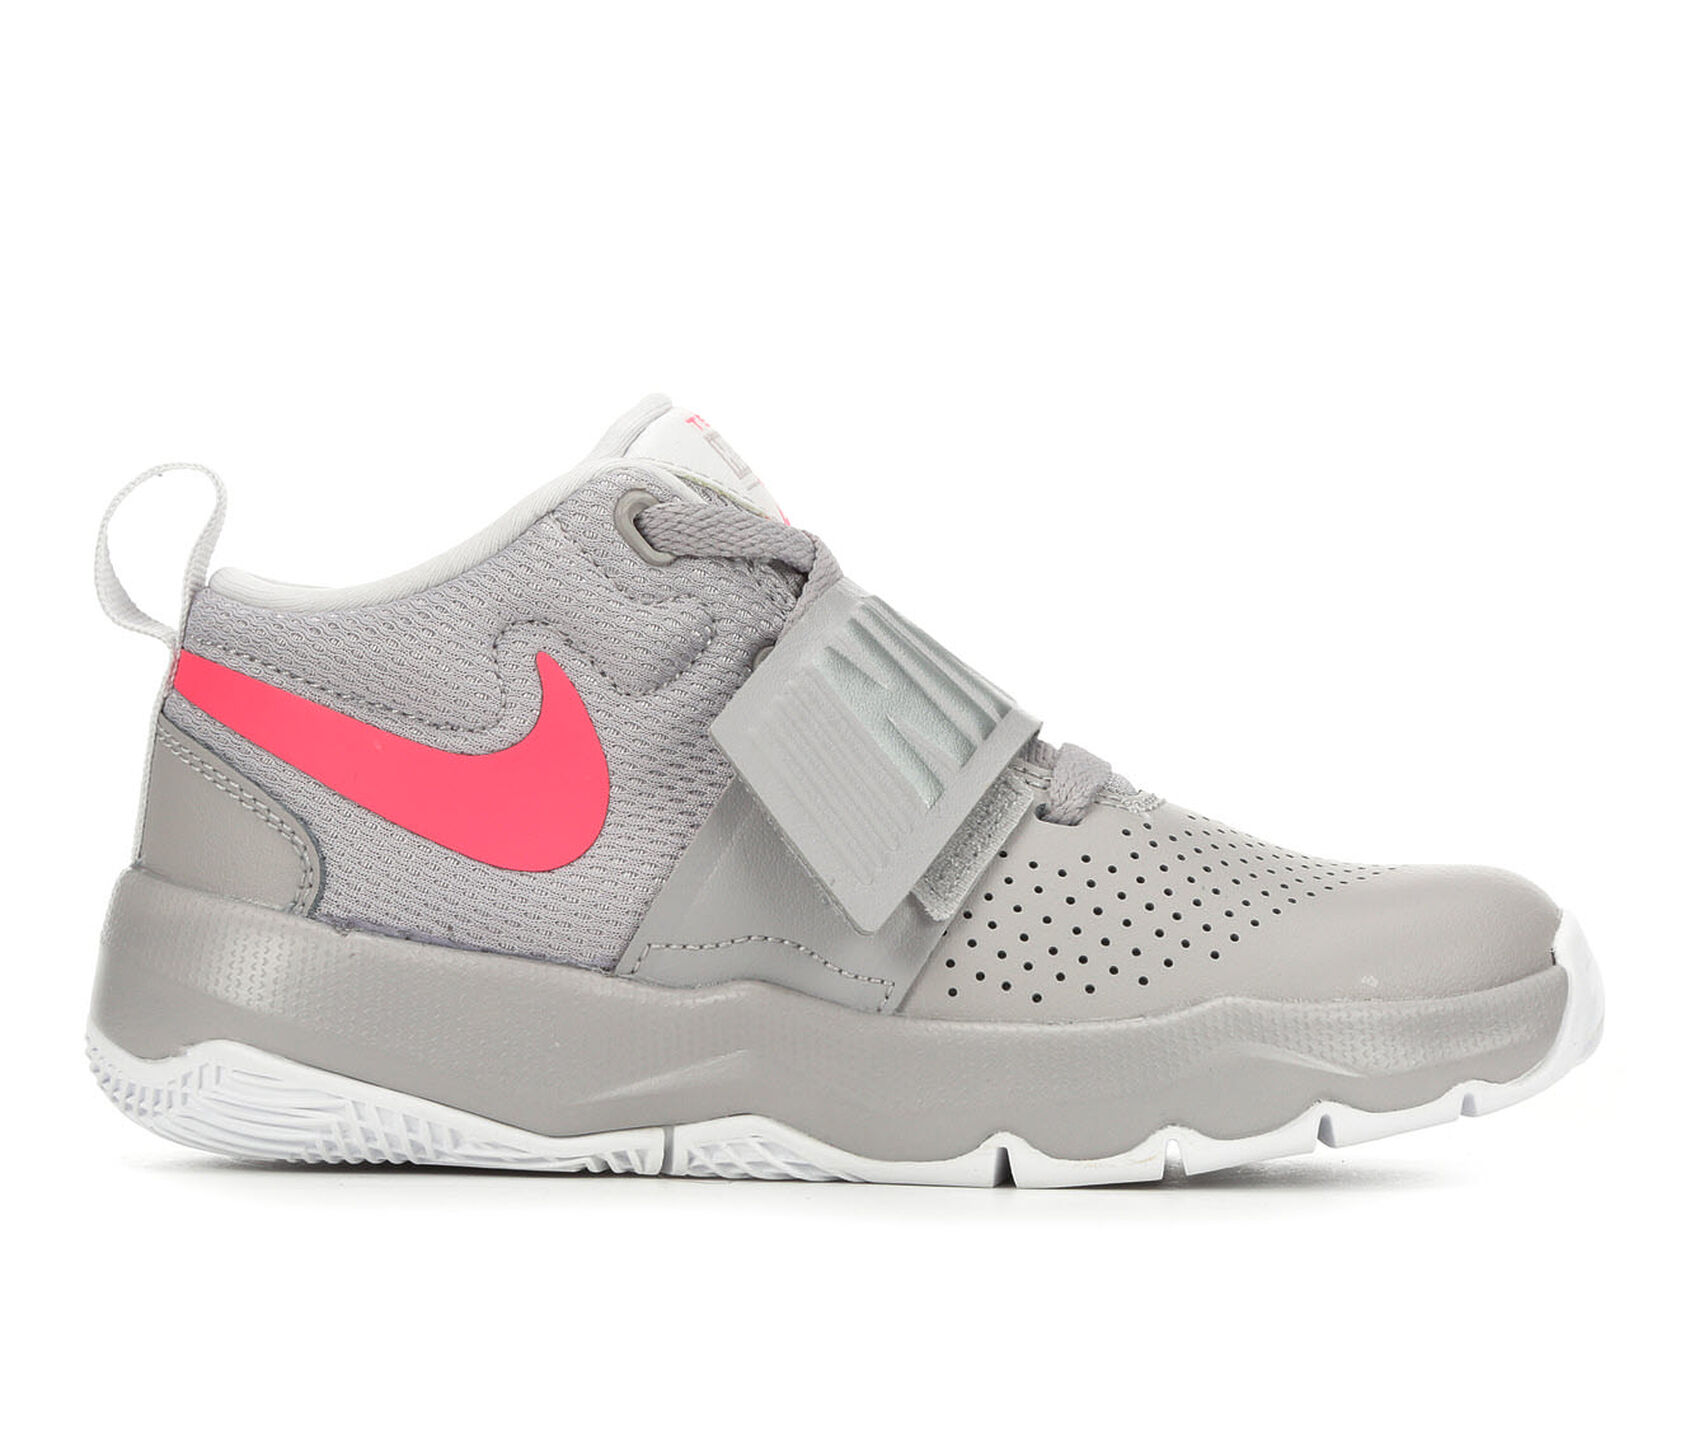 ... Nike Little Kid Team Hustle D8 High Top Basketball Shoes. Previous aa45926f5